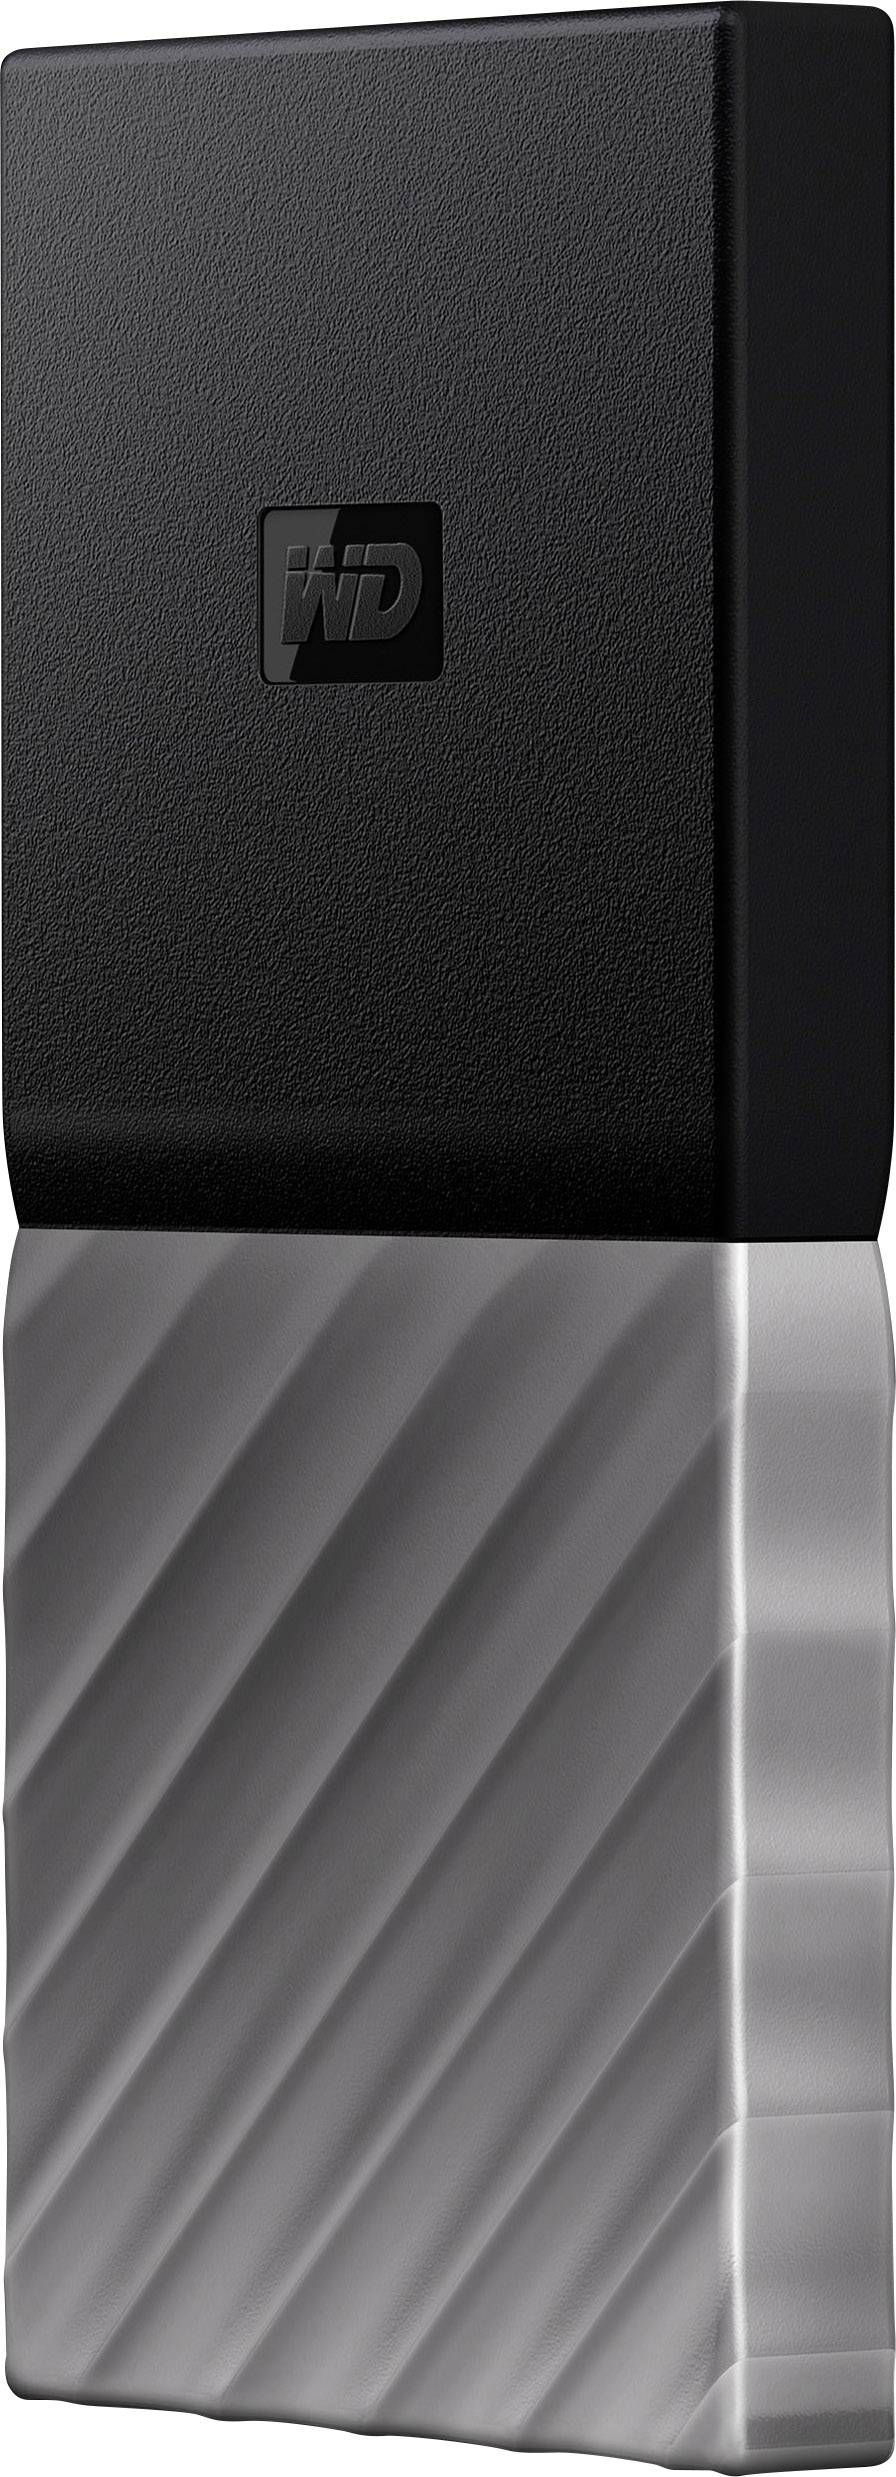 Black-Gray WD 1TB My Passport SSD Portable Storage USB 3.1 WDBK3E0010PSL-WESN